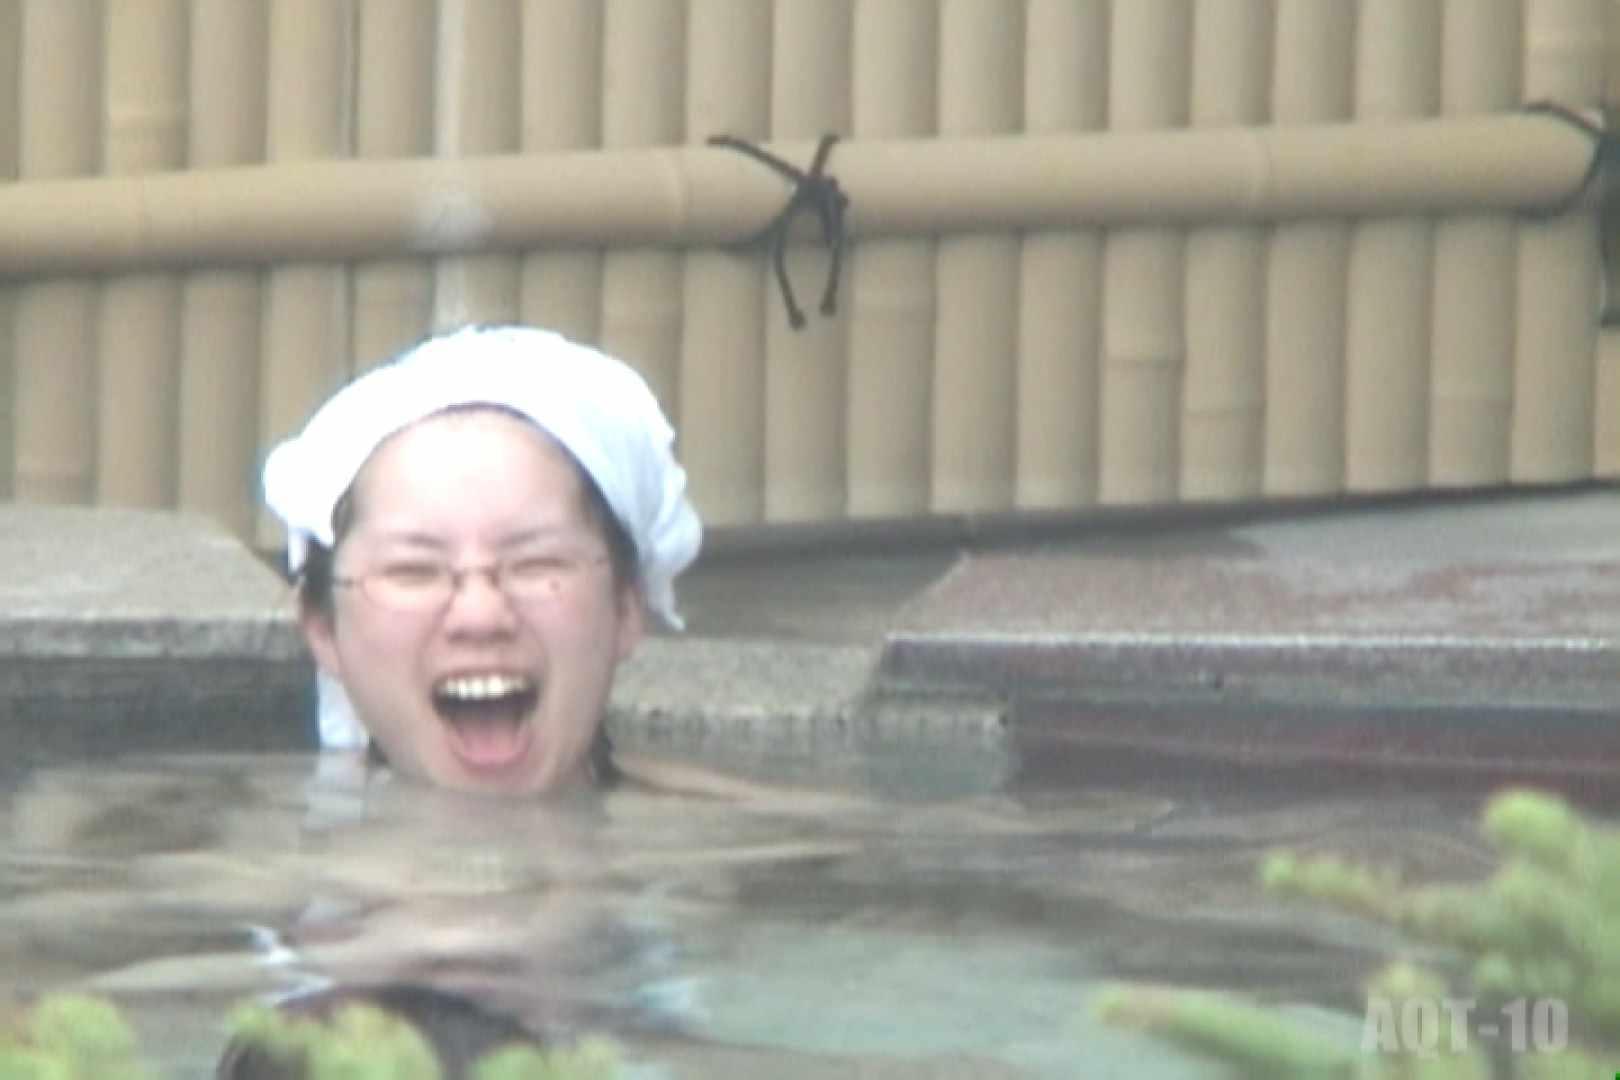 Aquaな露天風呂Vol.796 露天風呂突入 | 盗撮師作品  86pic 25